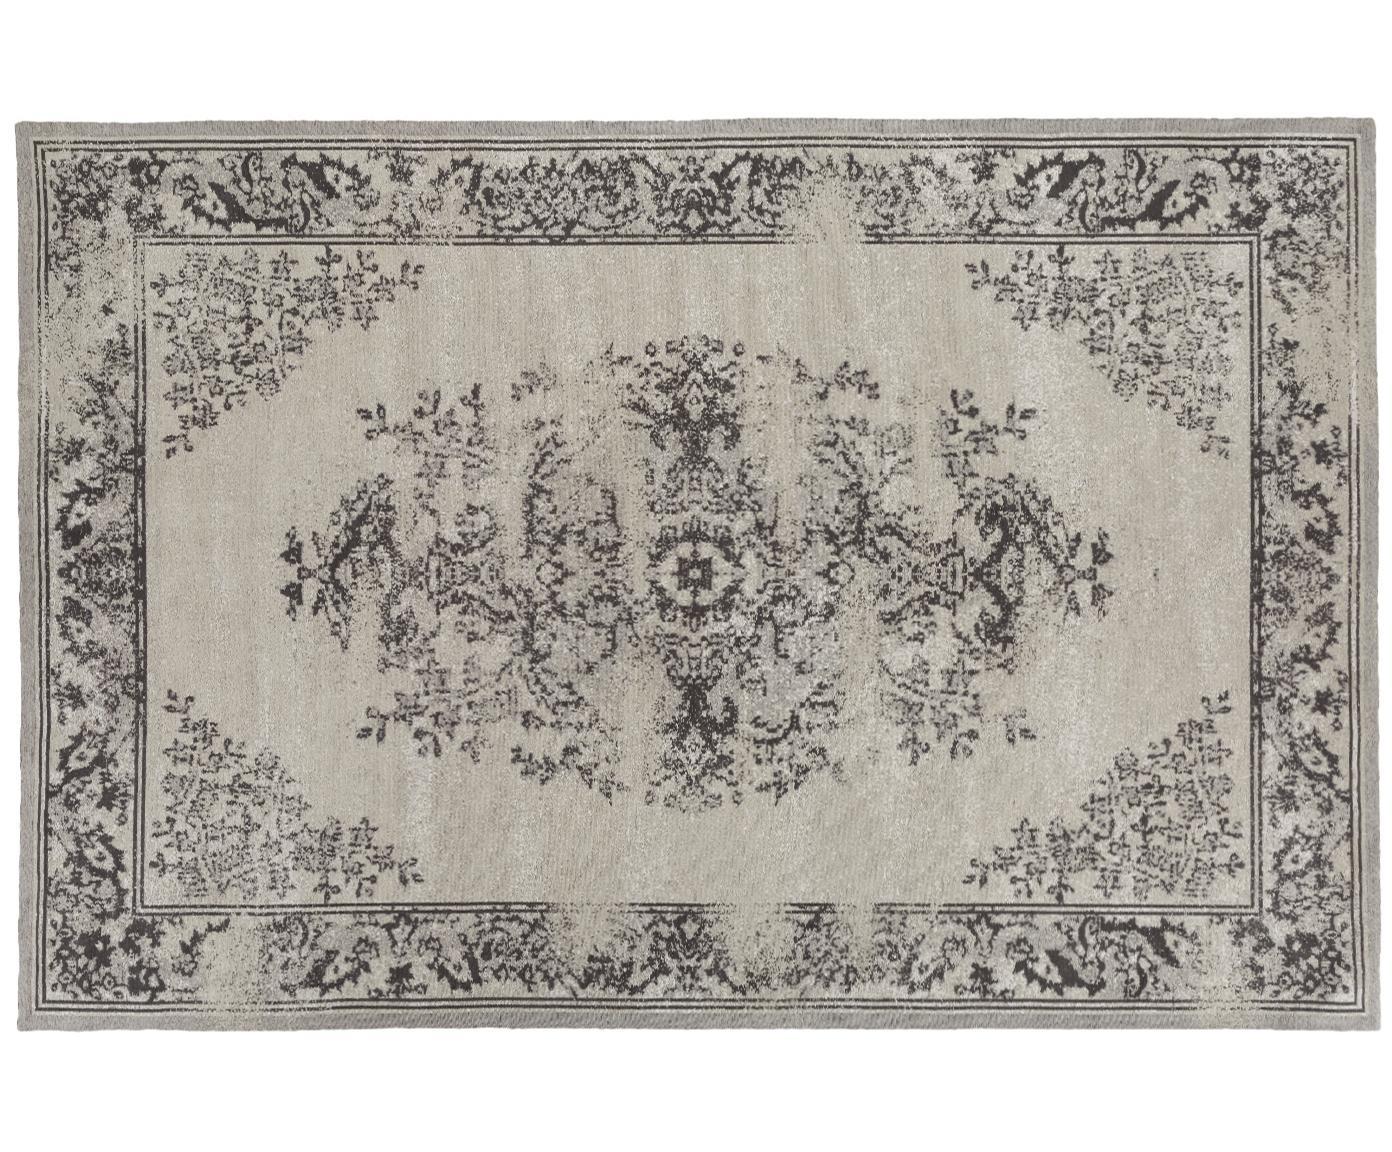 Chenille vloerkleed Touch, Bovenzijde: 95% katoen, 5% polyester, Onderzijde: 100% katoen, Grijs, 200 x 300 cm